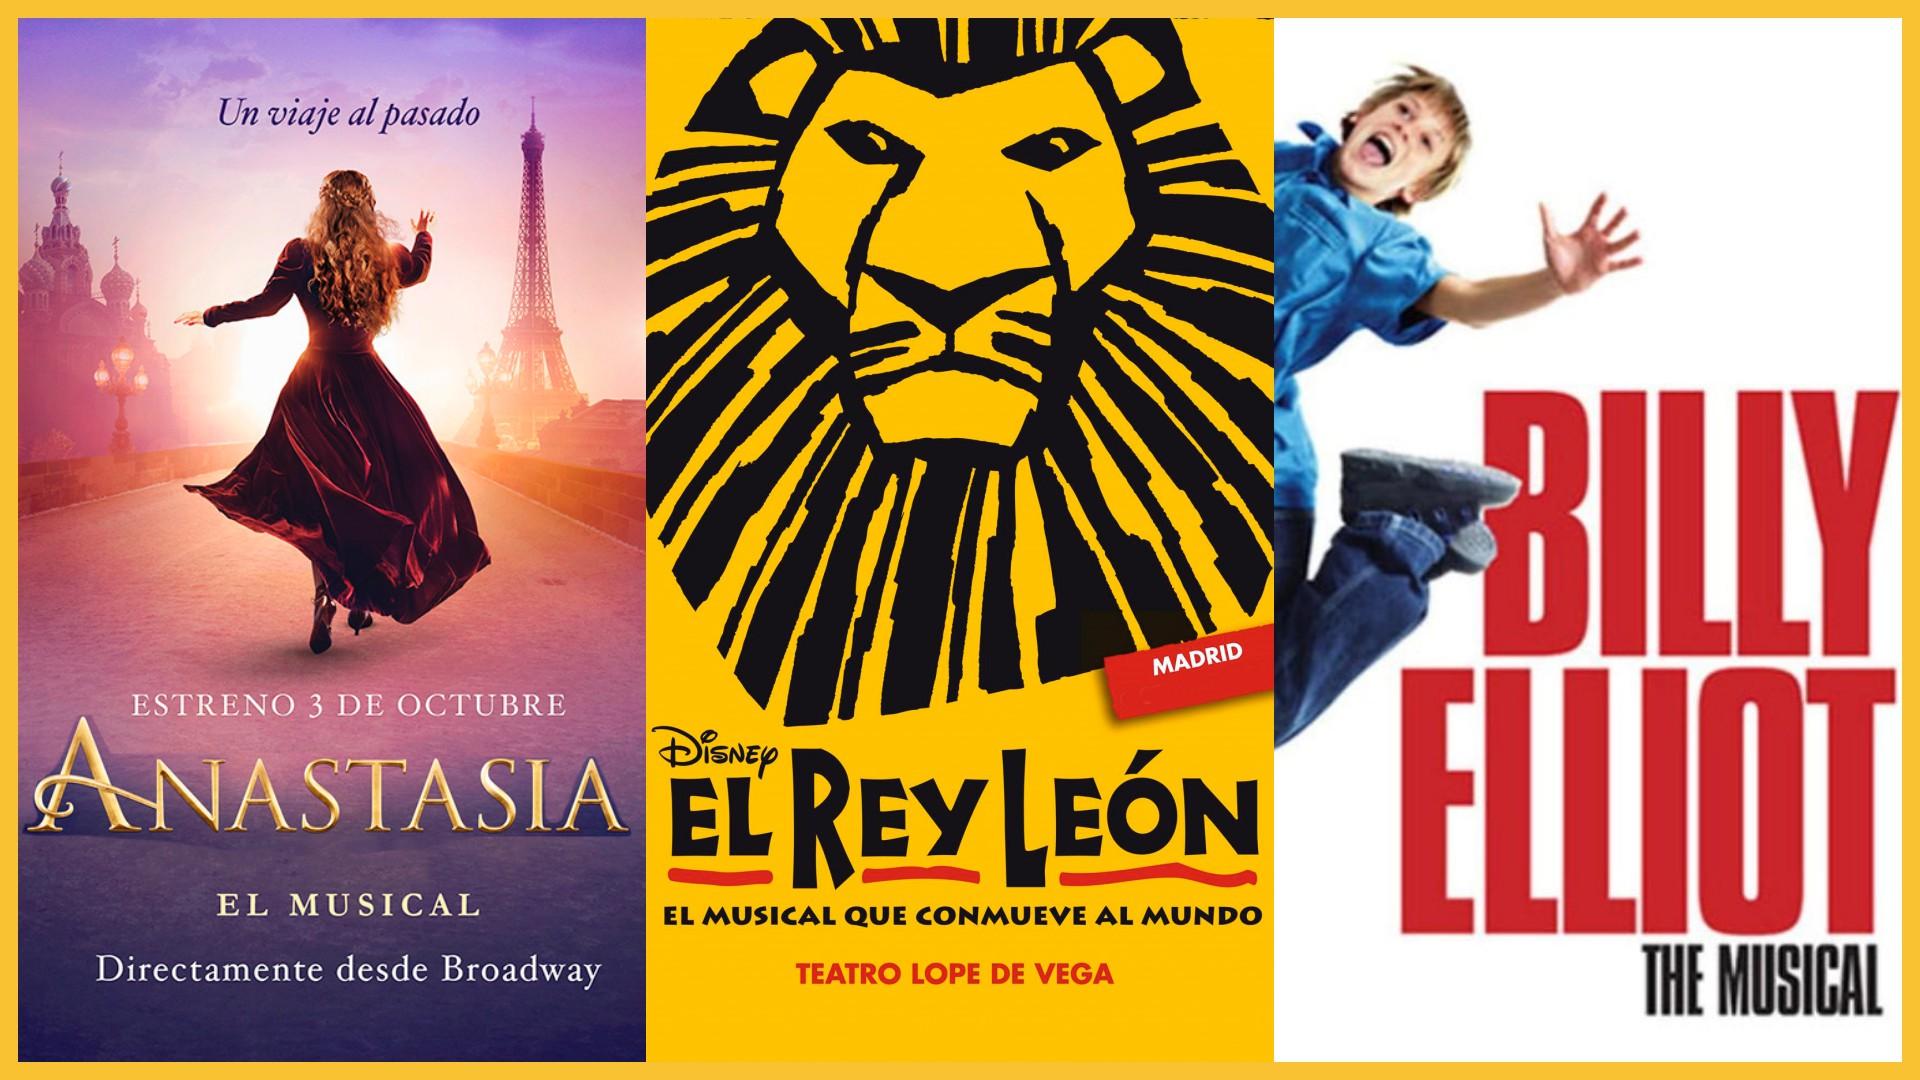 musicals madrid el rey leon billy elliot anastasia